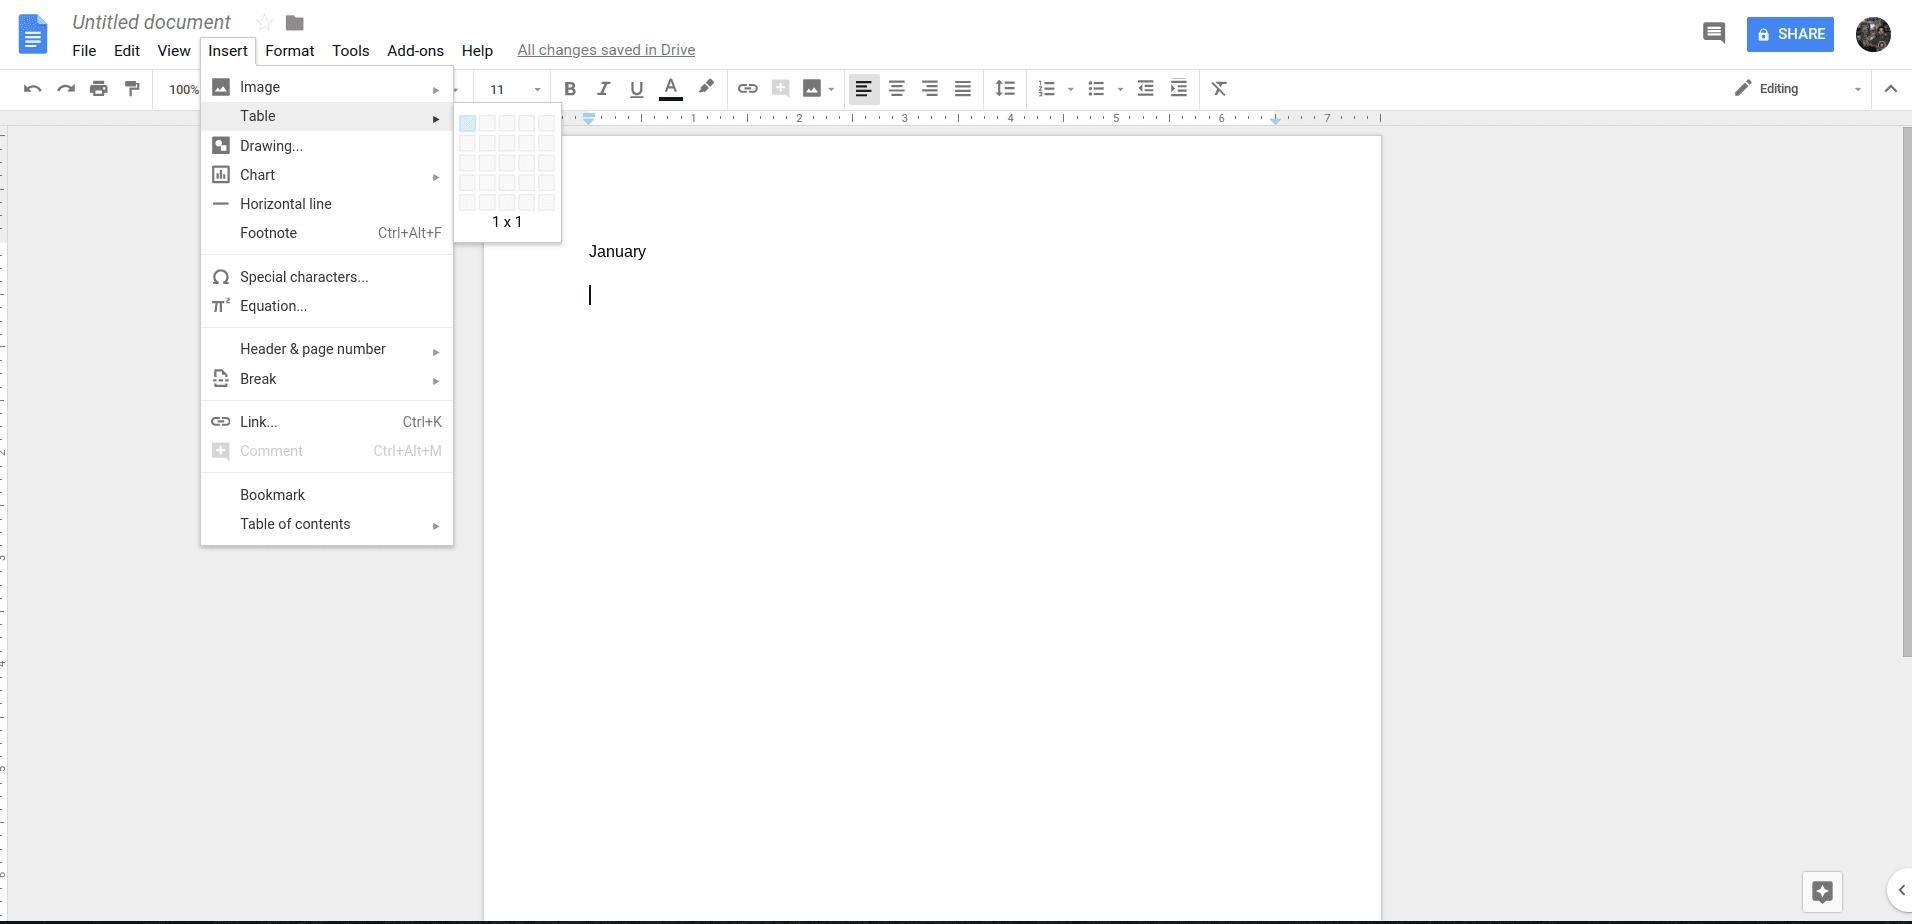 How To Create A Calendar In Google Docs - Calendar Calendar Template On Google Drive